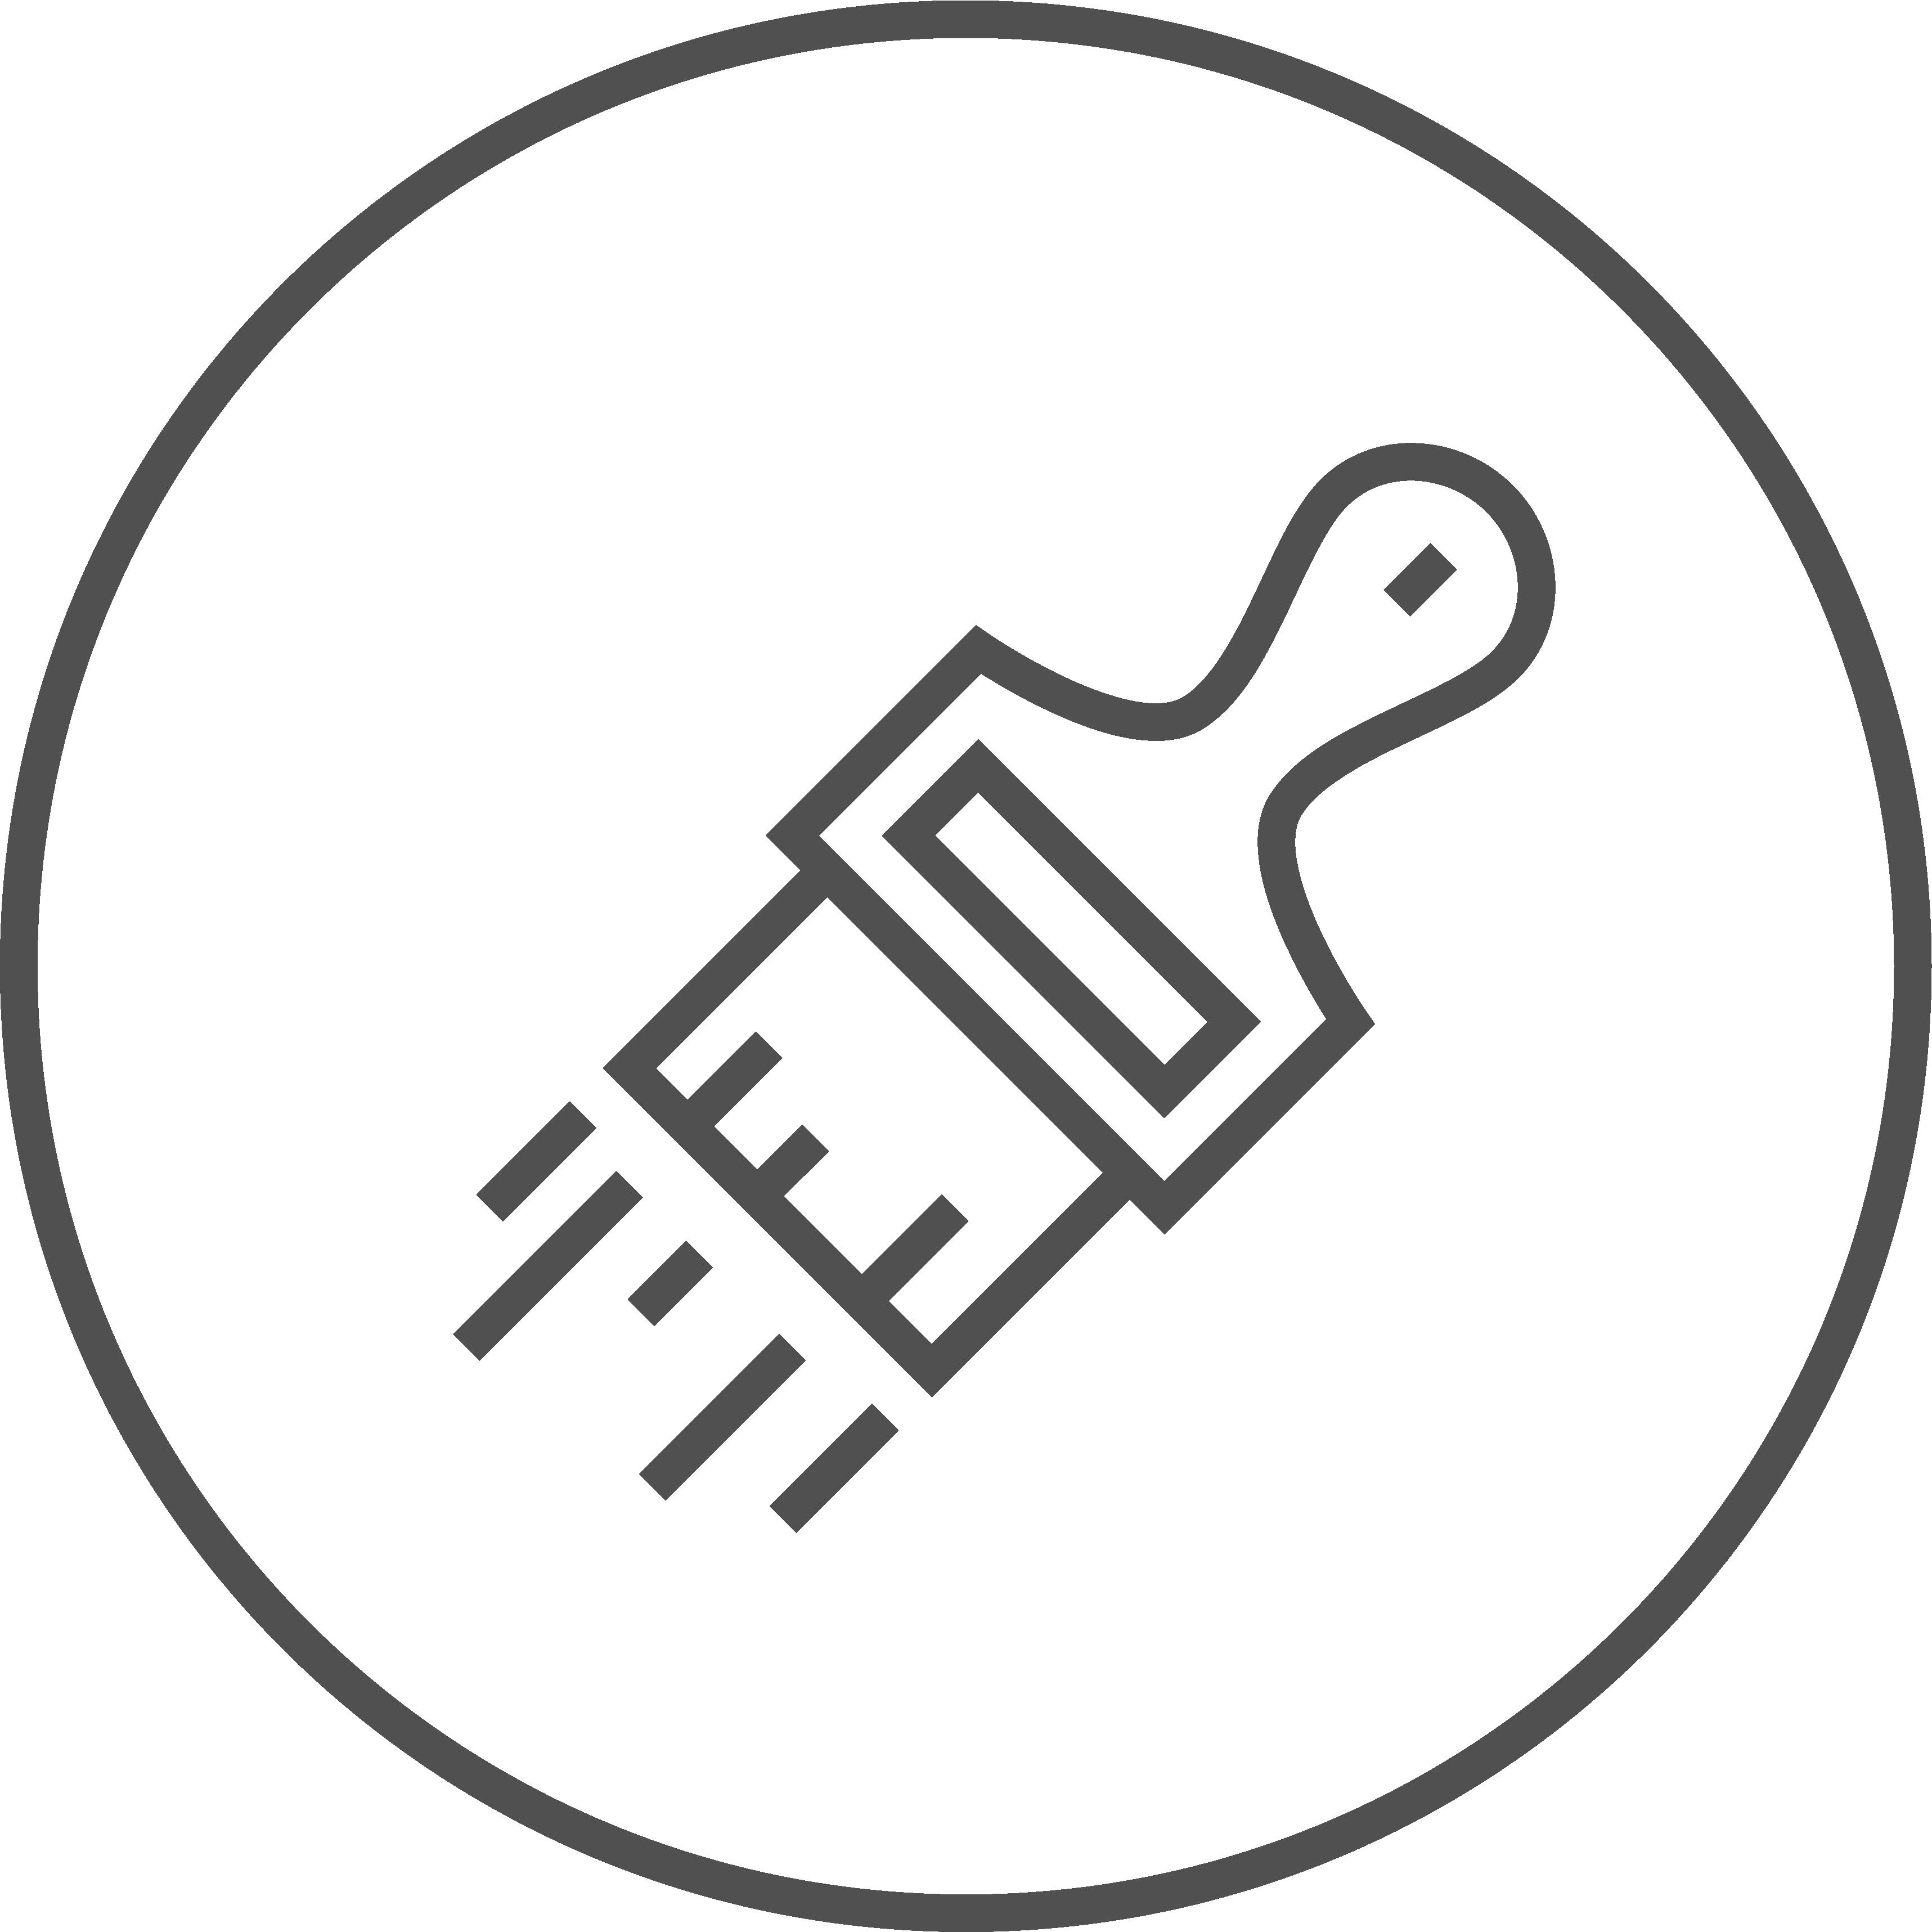 Innenausbau Icon